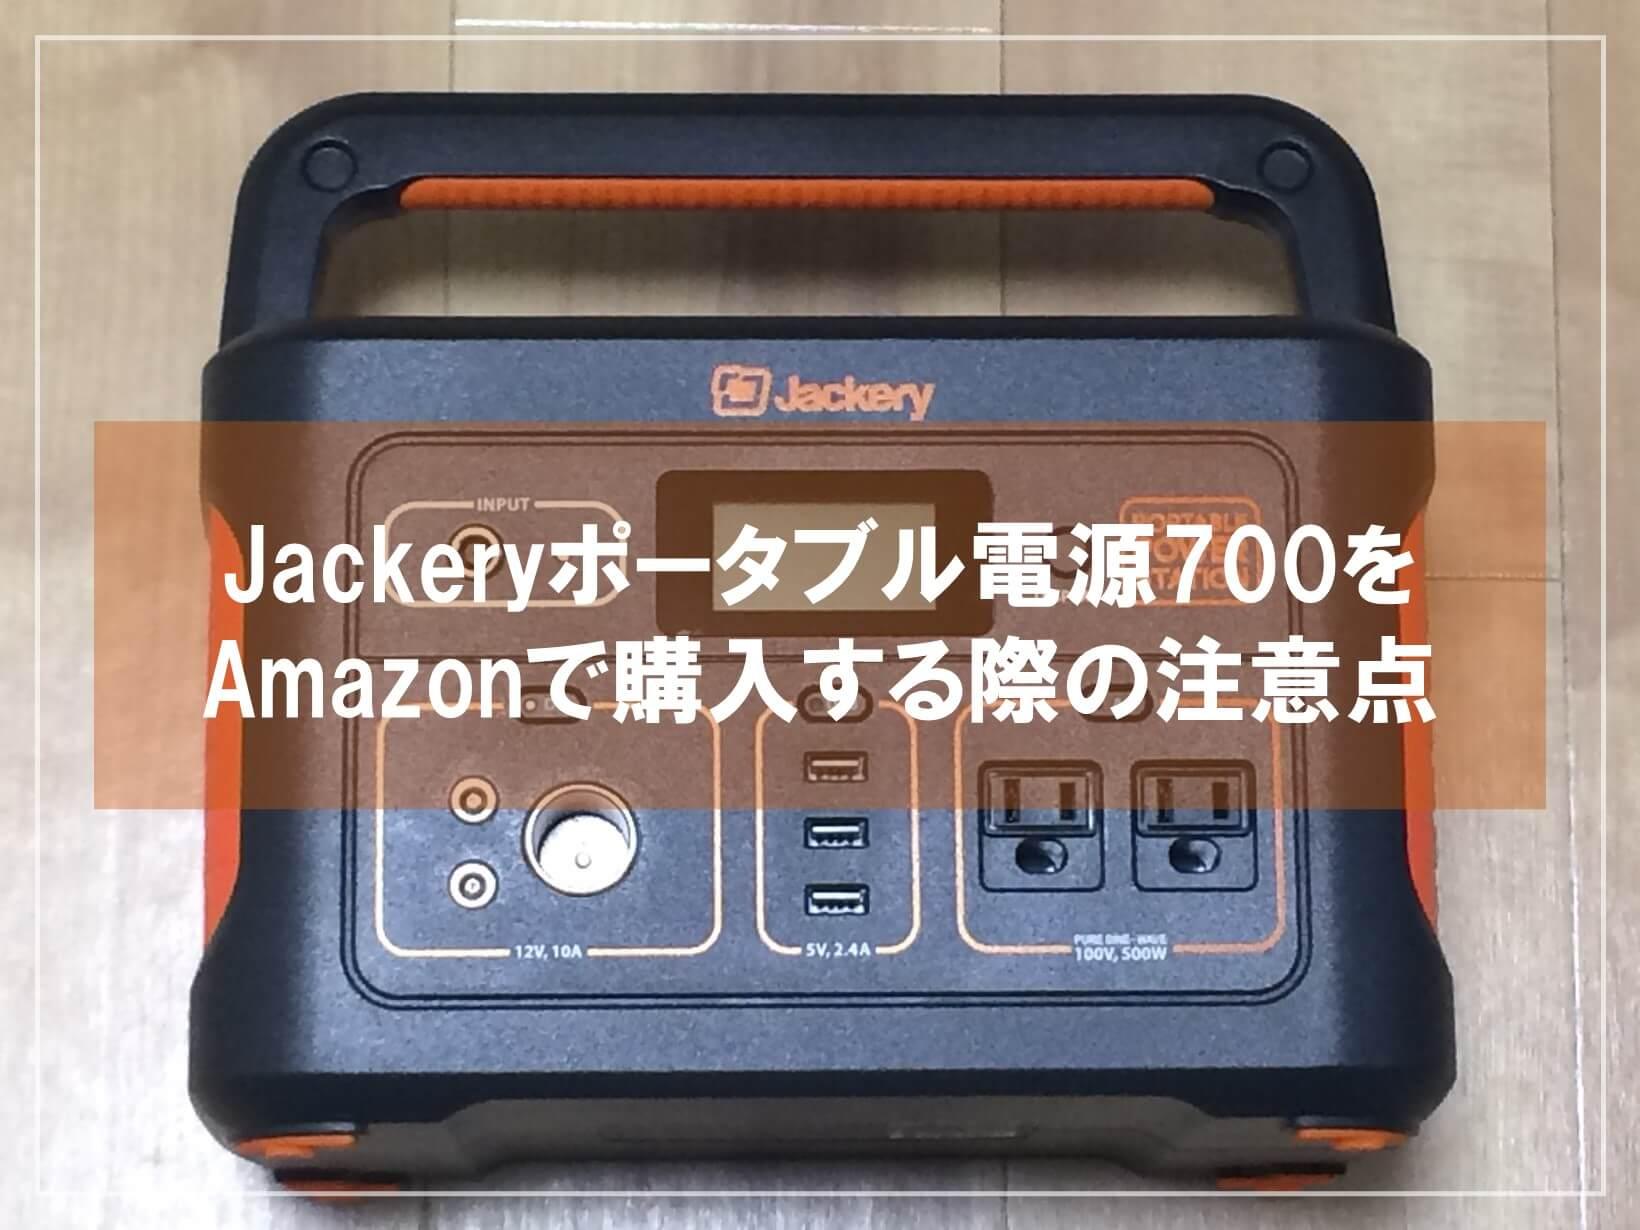 Jackeryポータブル電源700をAmazonで購入する際の注意点